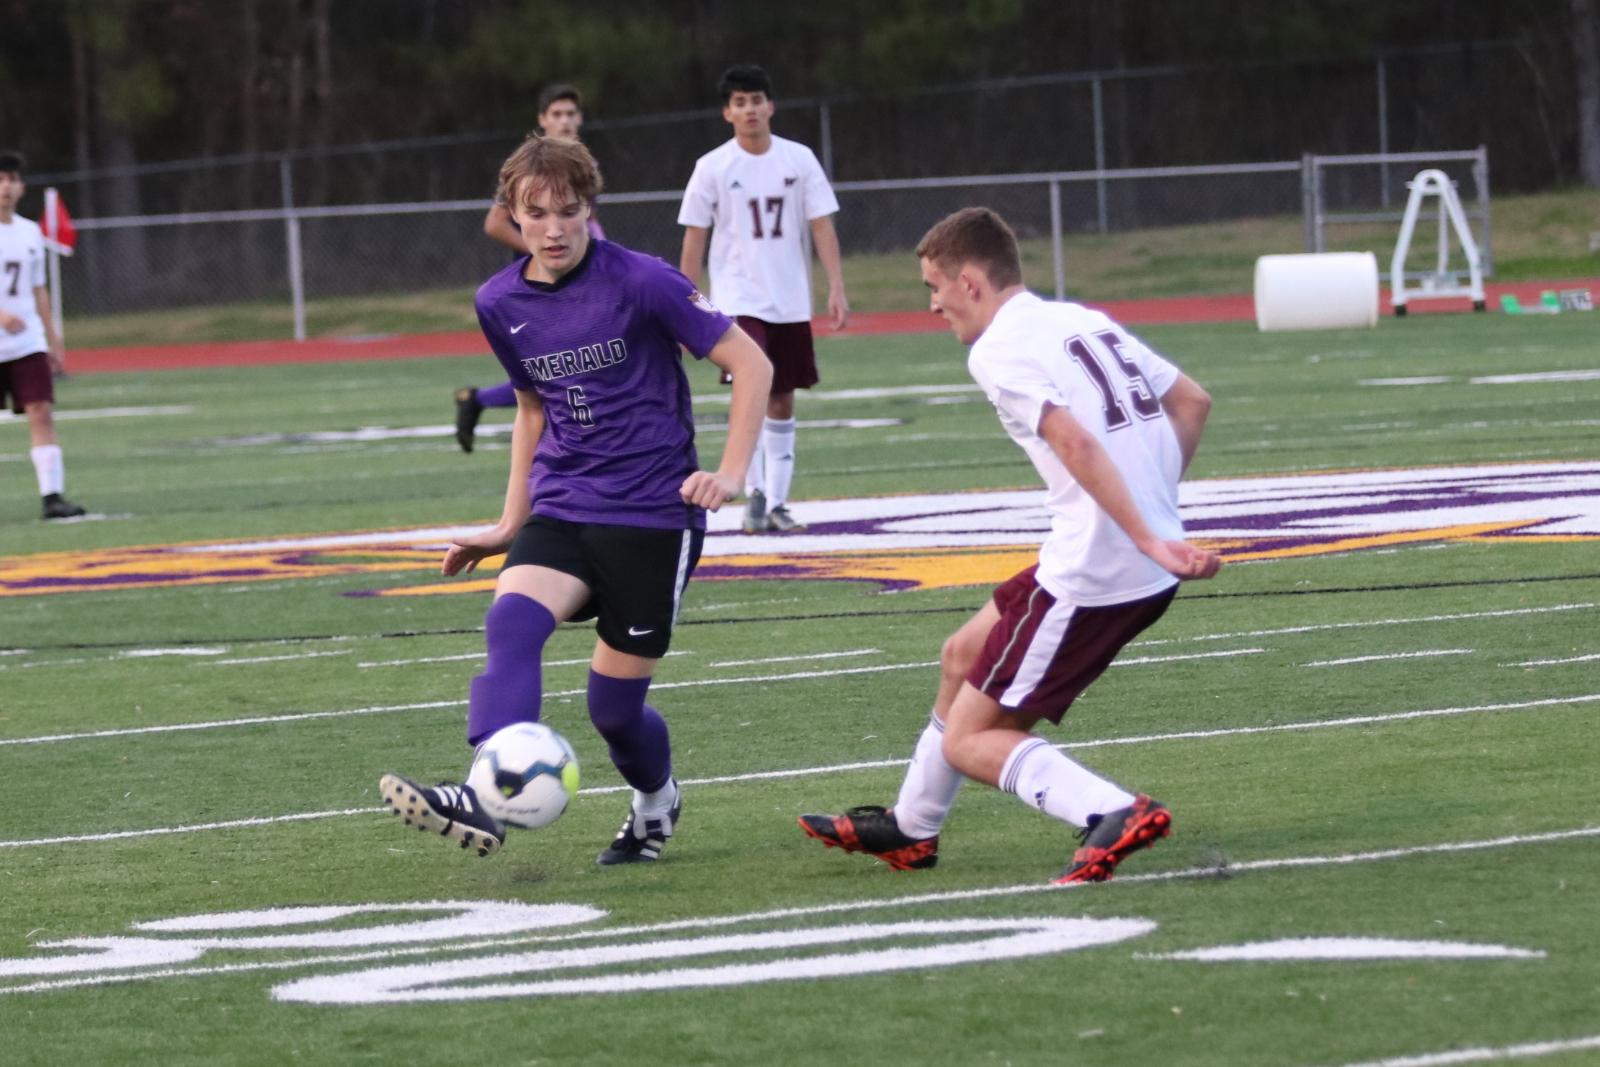 Boys Varsity Soccer defeats Woodruff 3-1